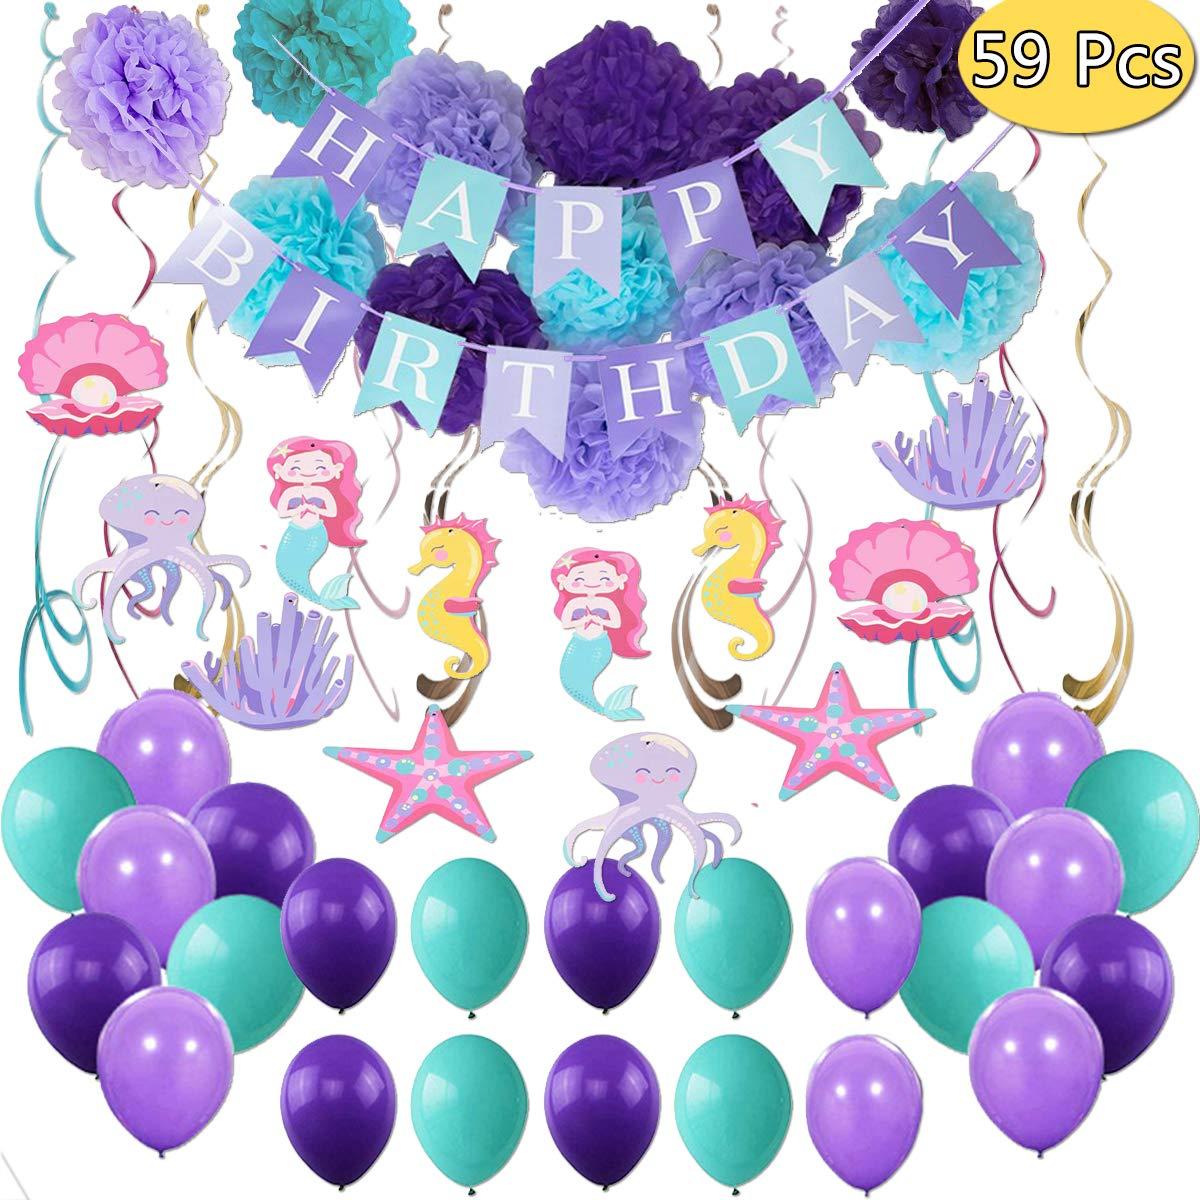 THAWAY Mermaid Party Supplies Birthday Decorations Pom Happy Birthday Banners